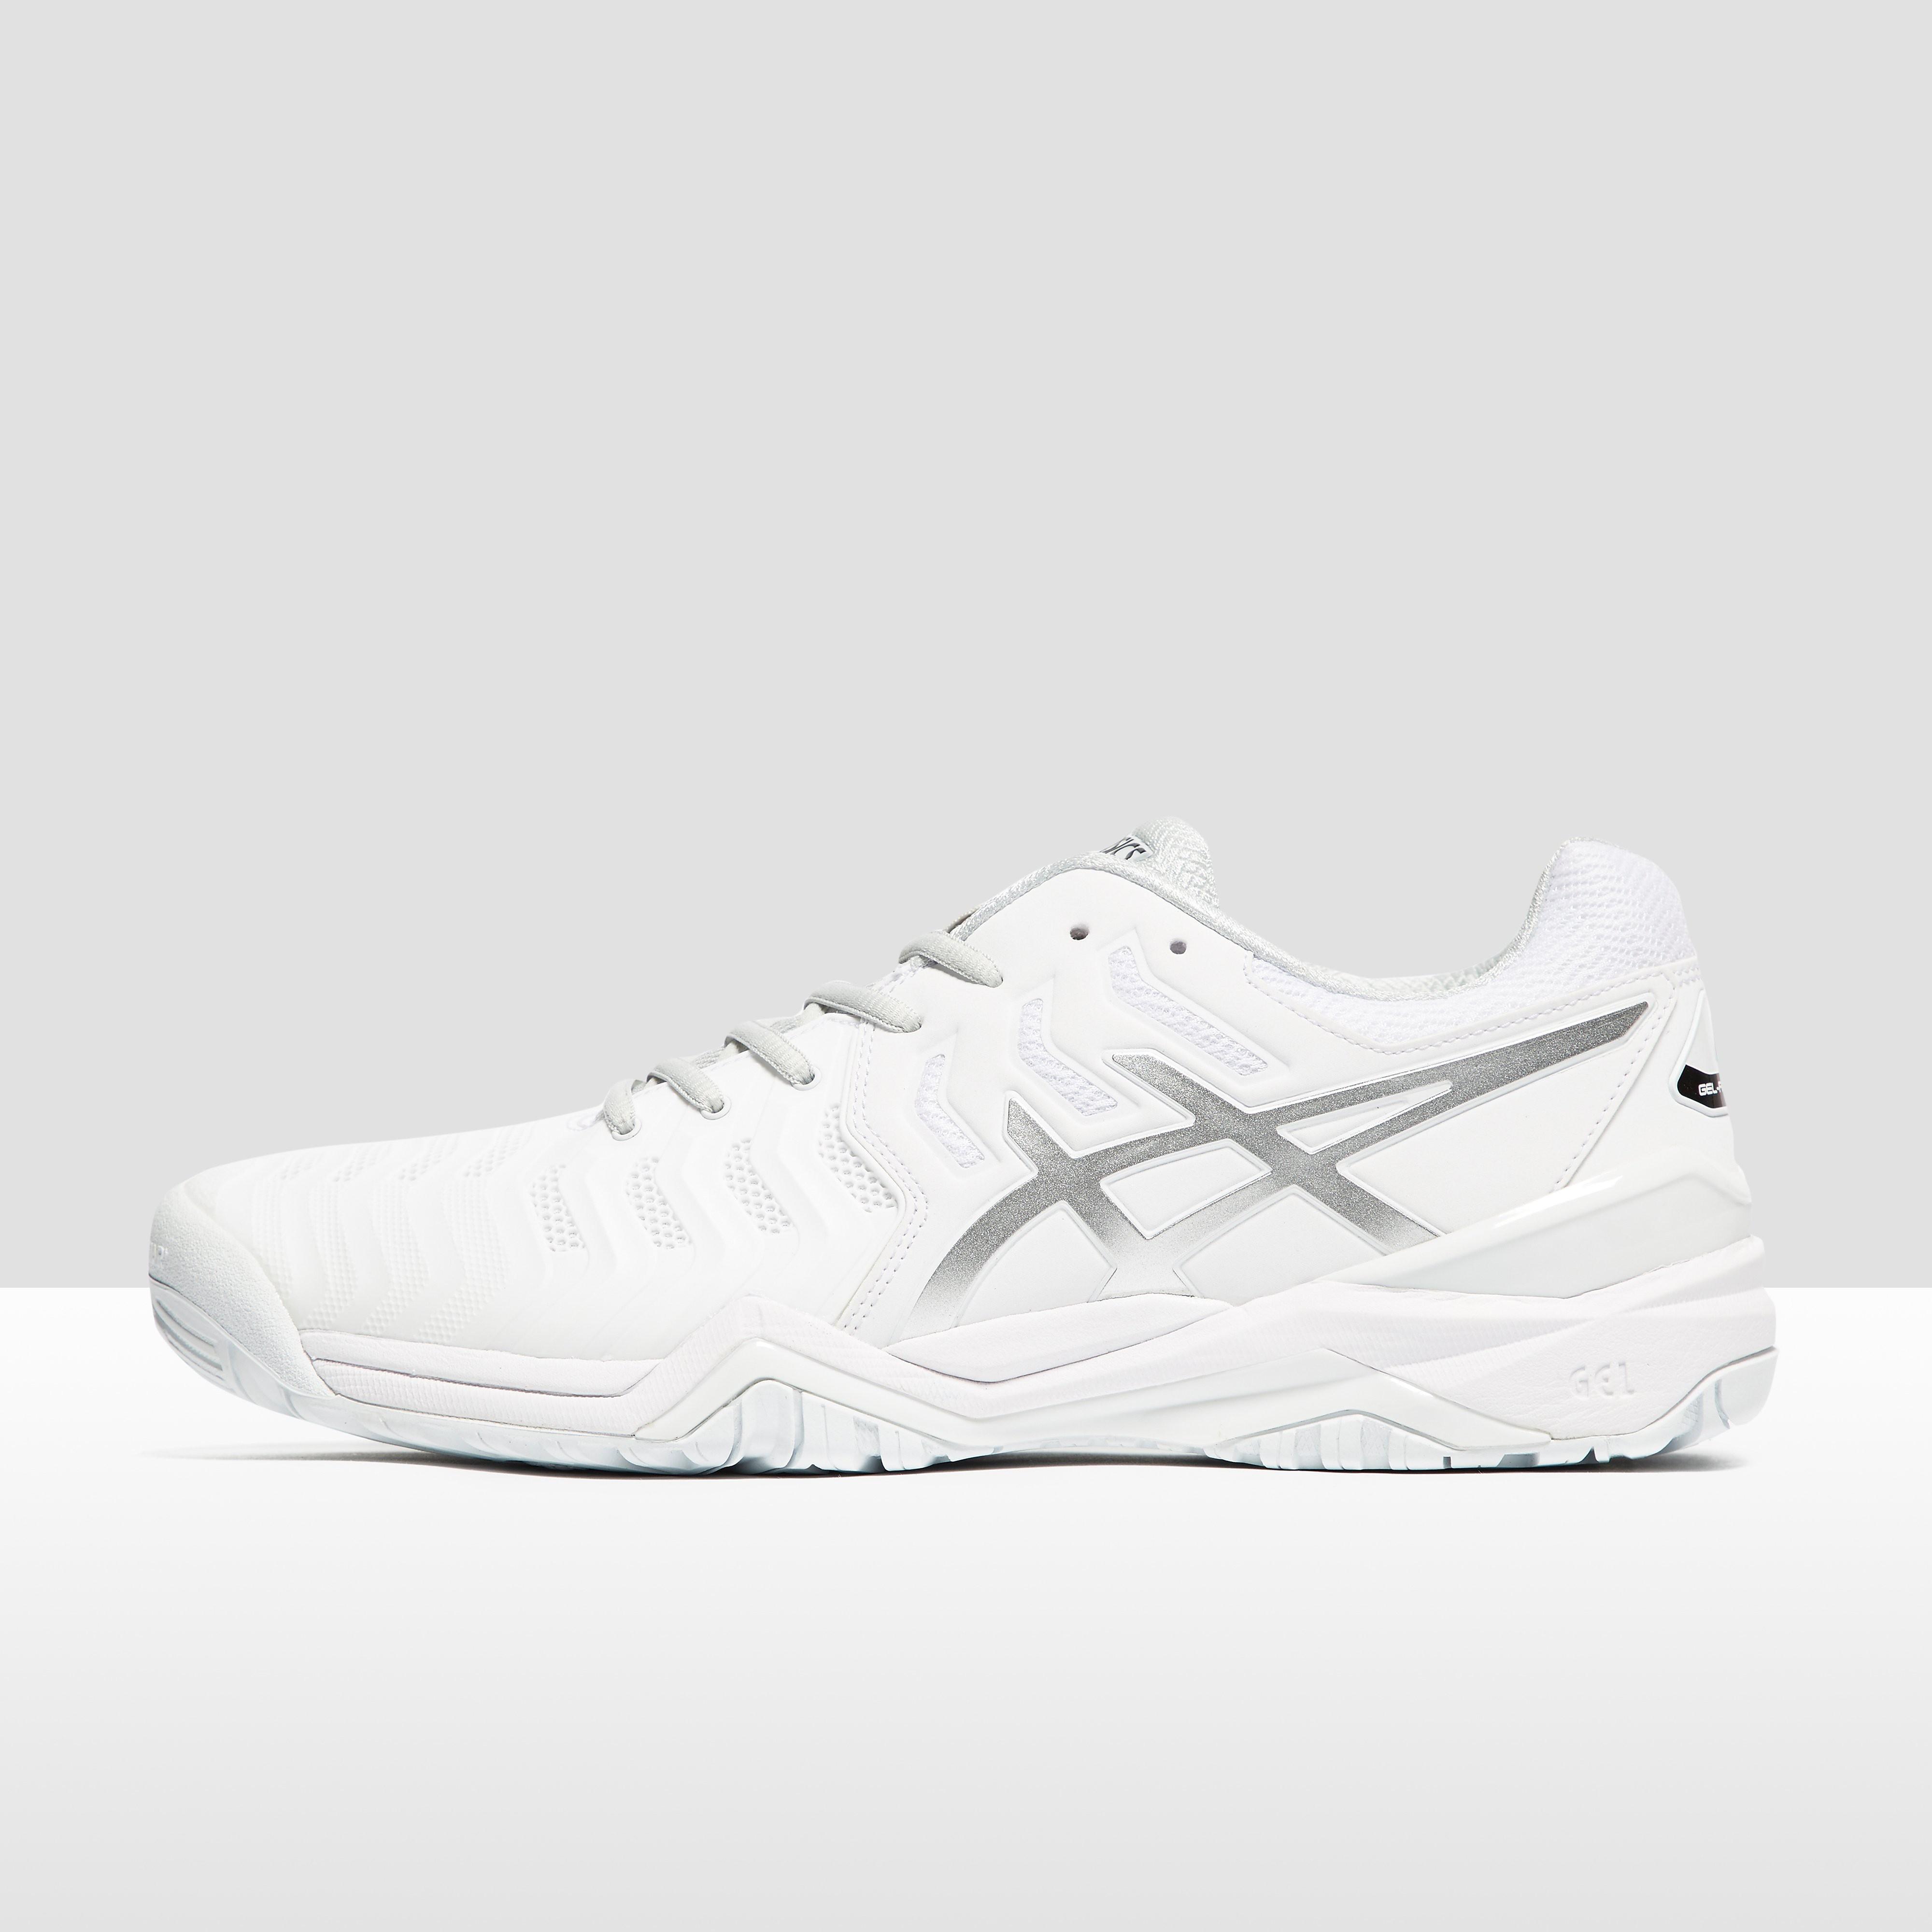 Asics Gel-Resolution 7 Men's Tennis Shoes